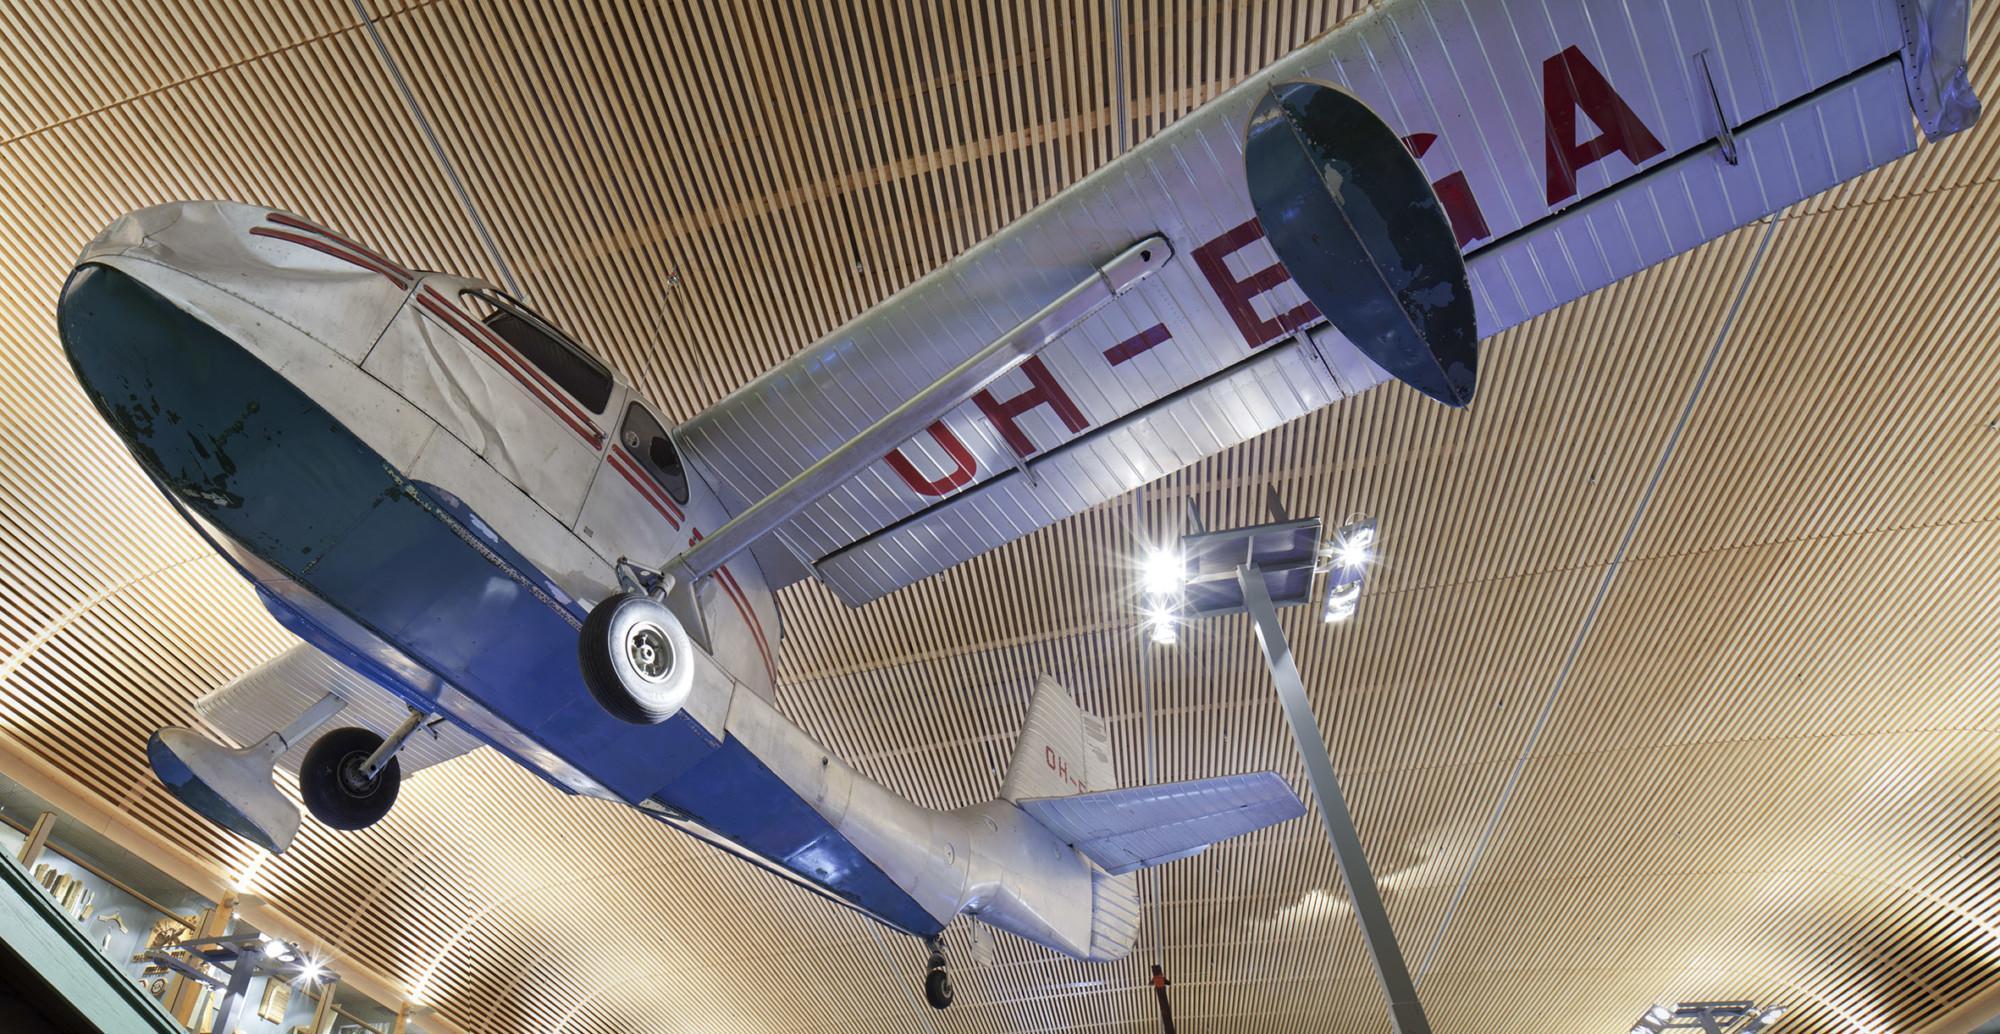 Republic RC-3 Seabee -amfibiolentokone-Timo Kilpeläinen-Koneaika